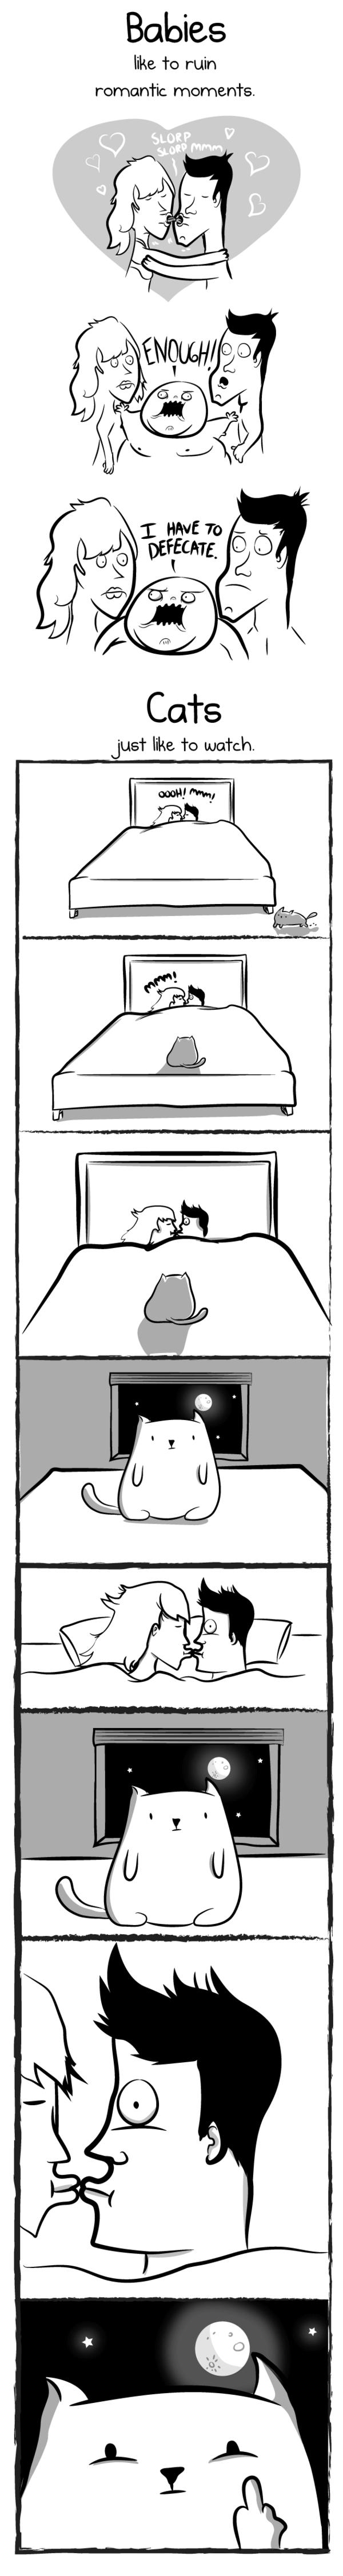 having a baby vs having a cat 7